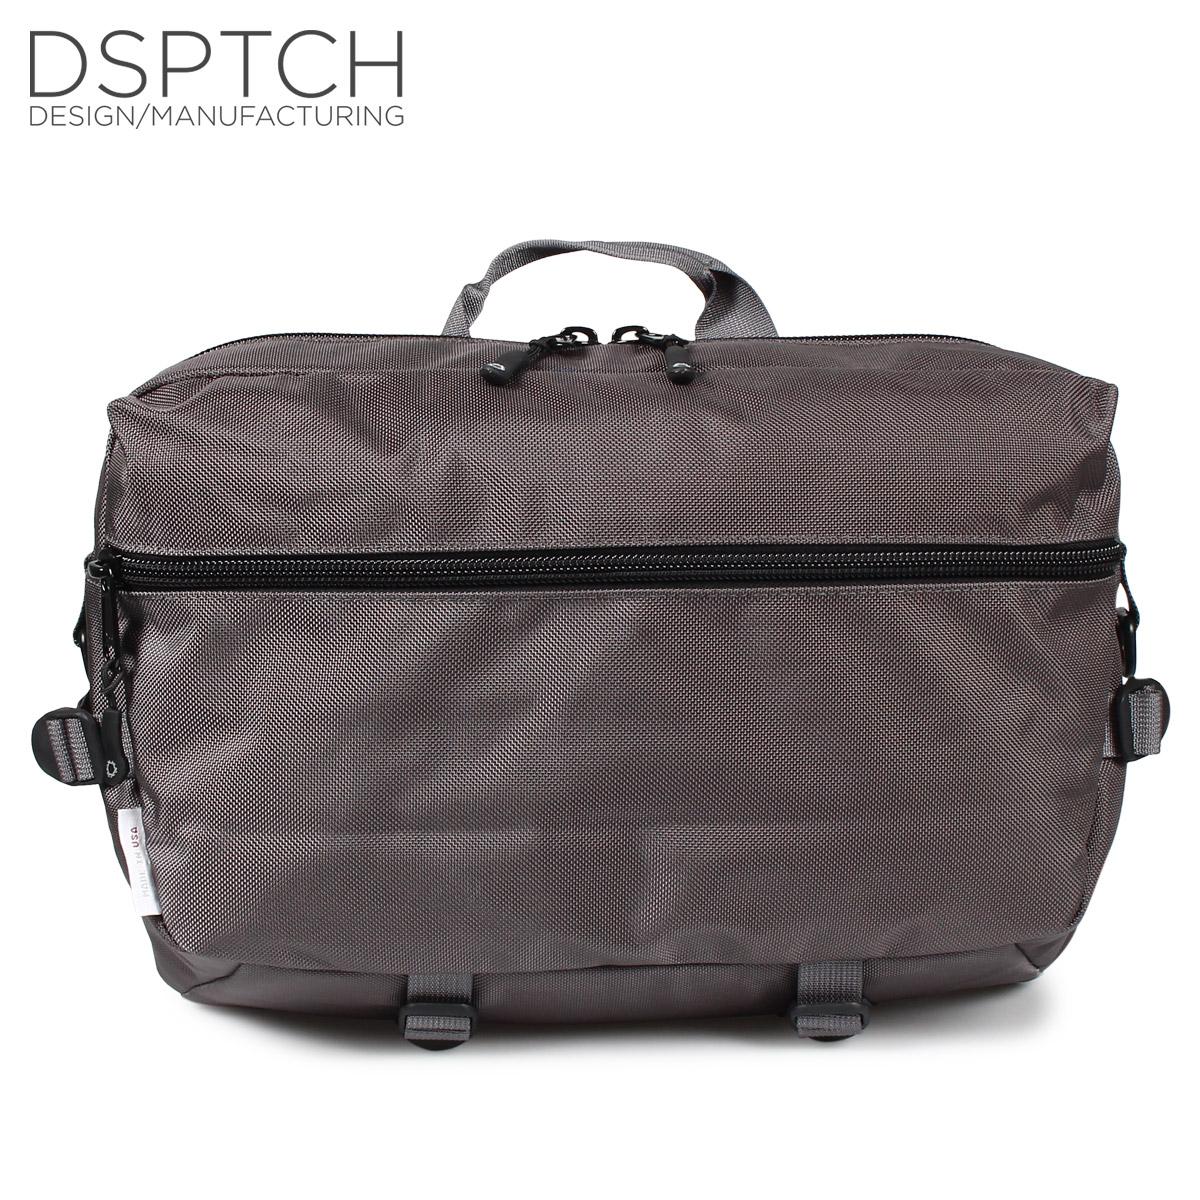 DSPTCH SLINGPACK ディスパッチ バック ショルダーバック スリングバッグ メンズ グレー PCK-SP-GRY